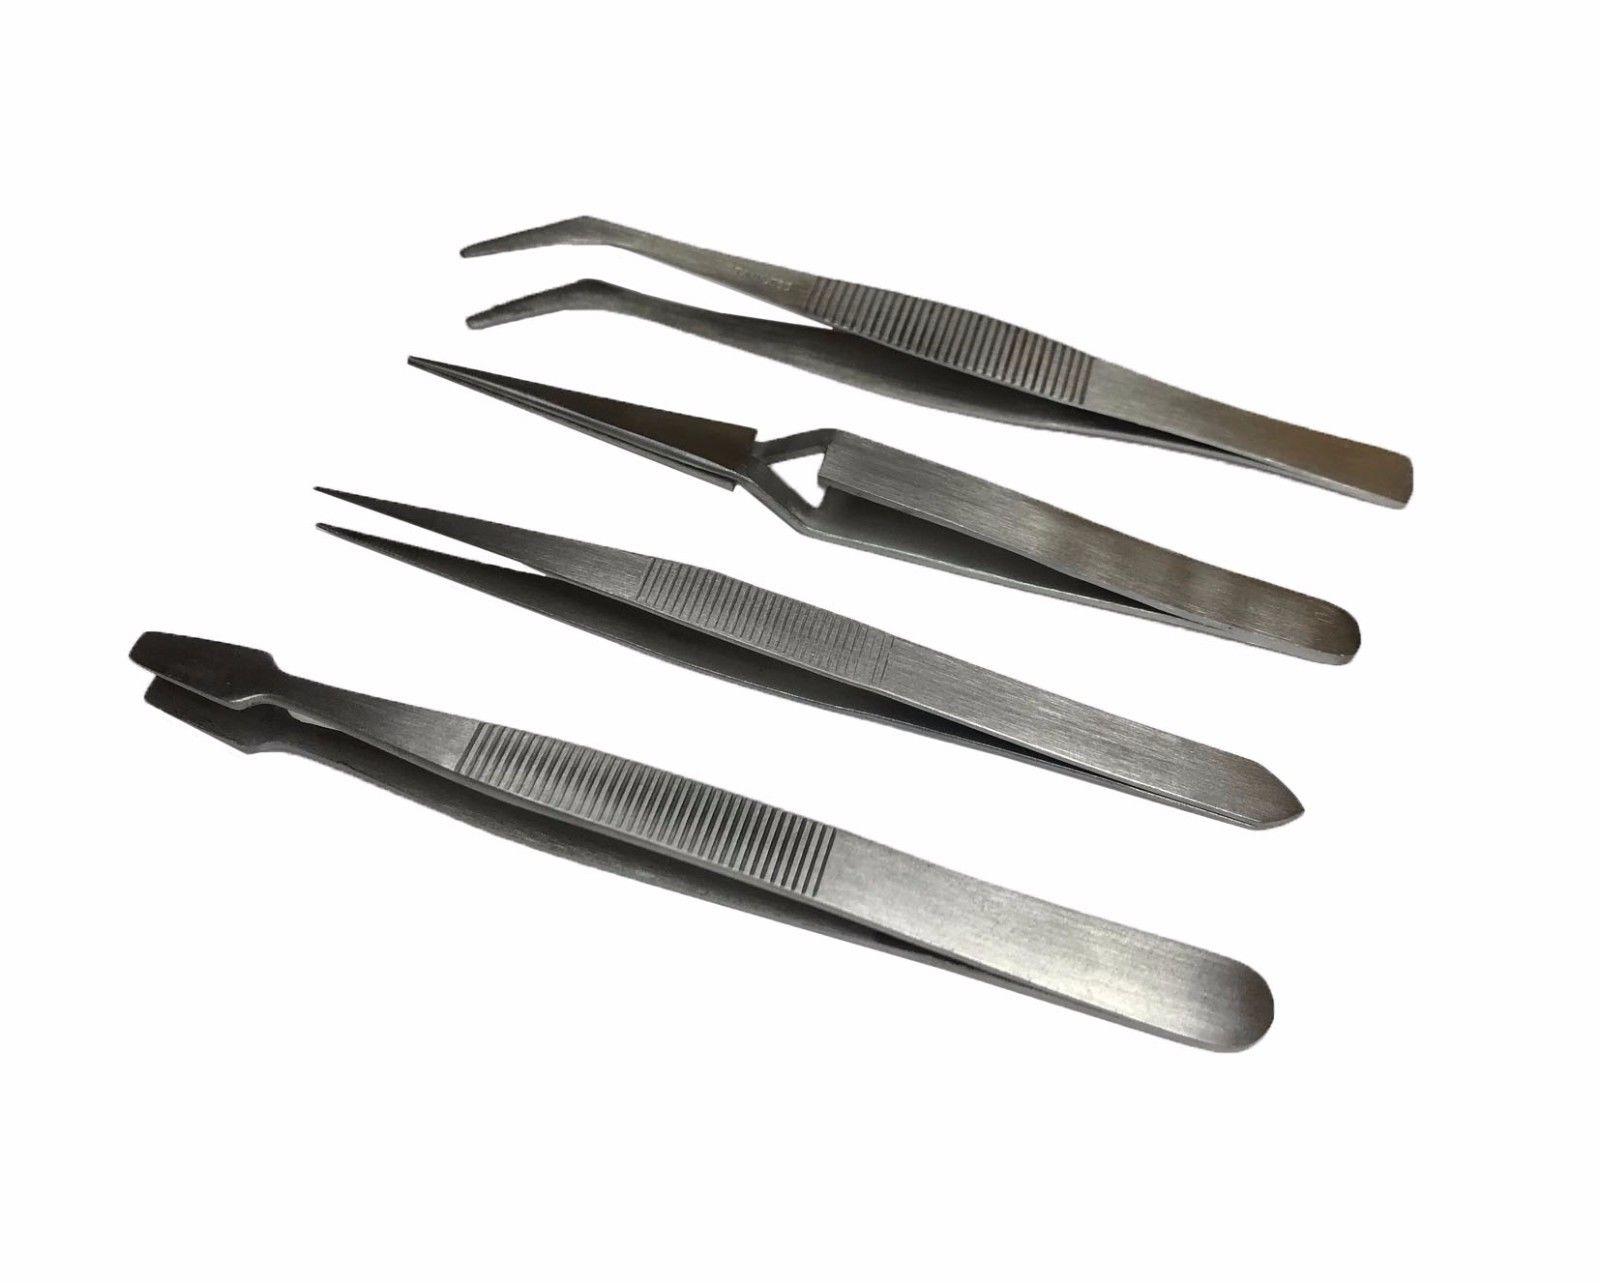 RDGTOOLS 5PC Diamond TWEEZER Set Pick UP Tool Slide Locking Shovel TWEEZER FINE T